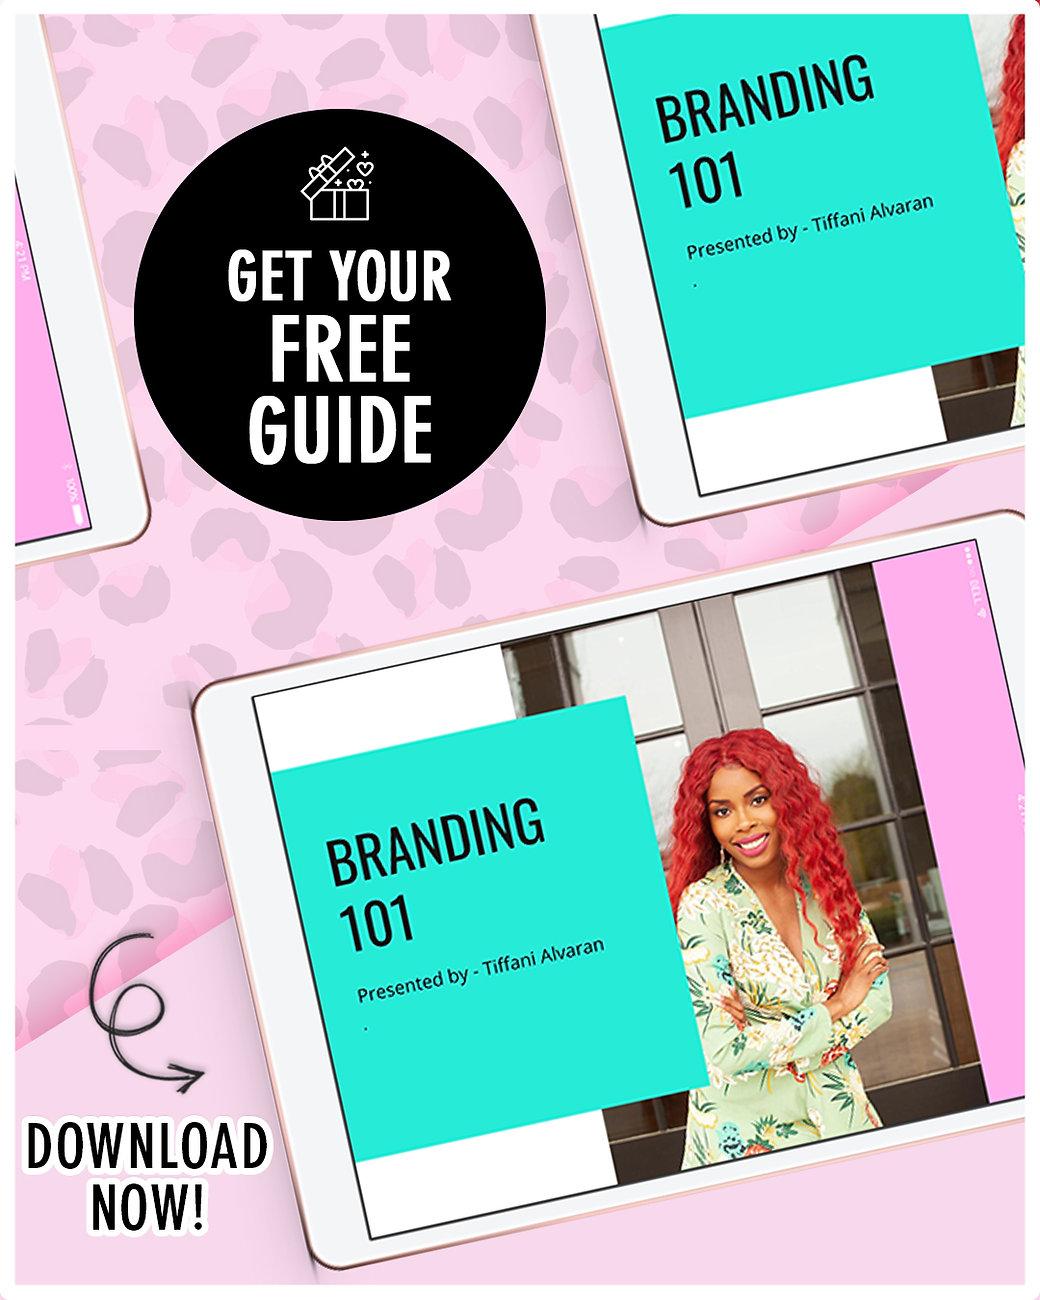 Branding101 Free Guide Web Ad.jpg